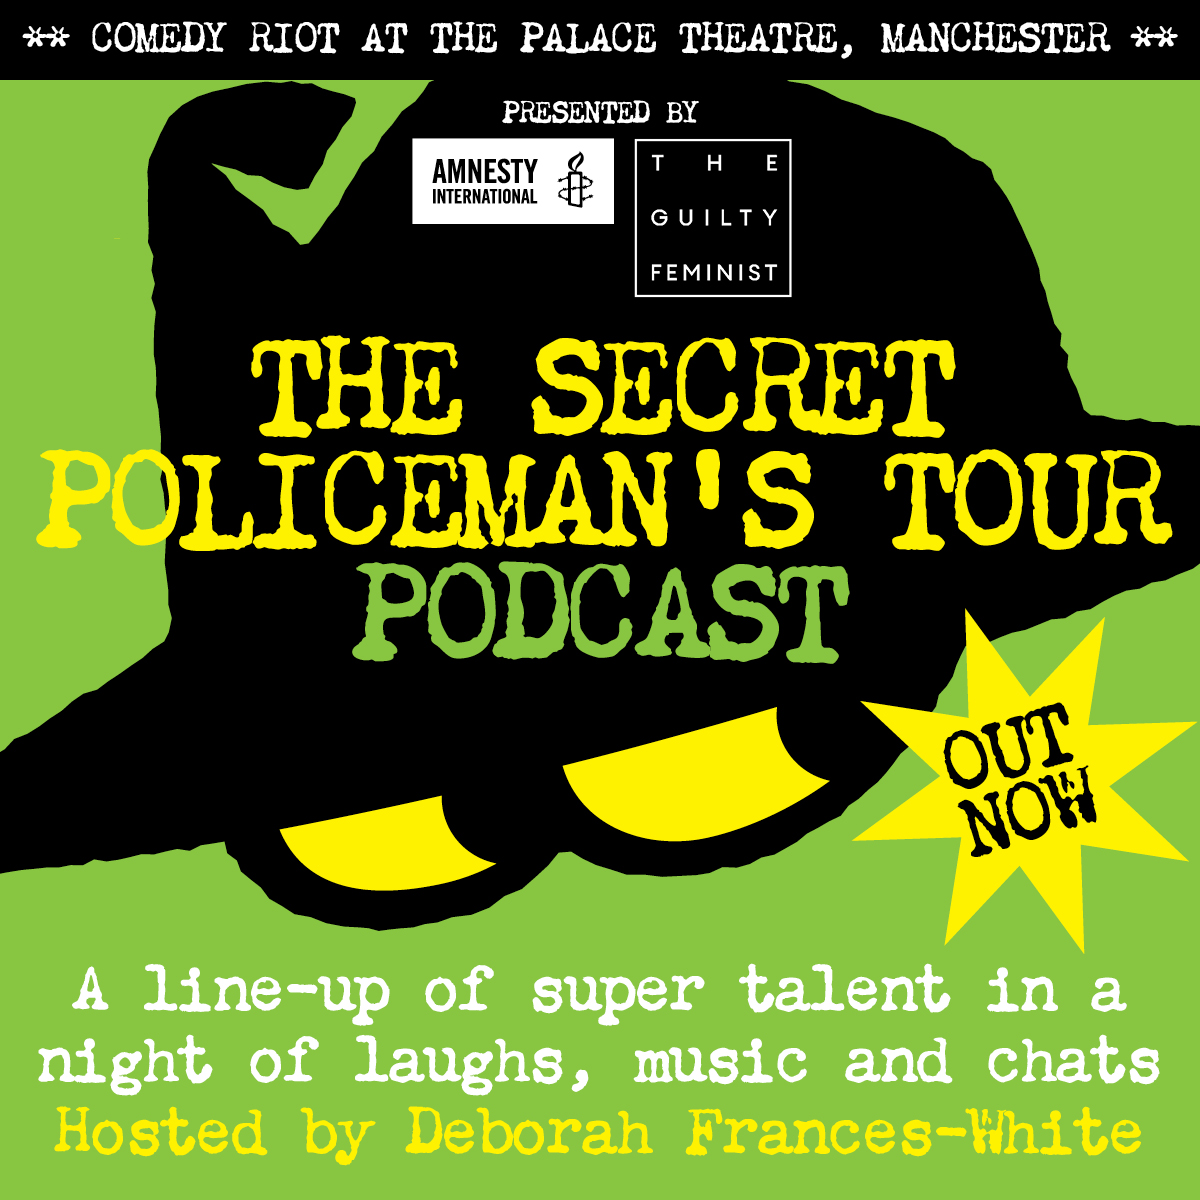 Artwork for The Secret Policeman's Tour - Manchester 2019